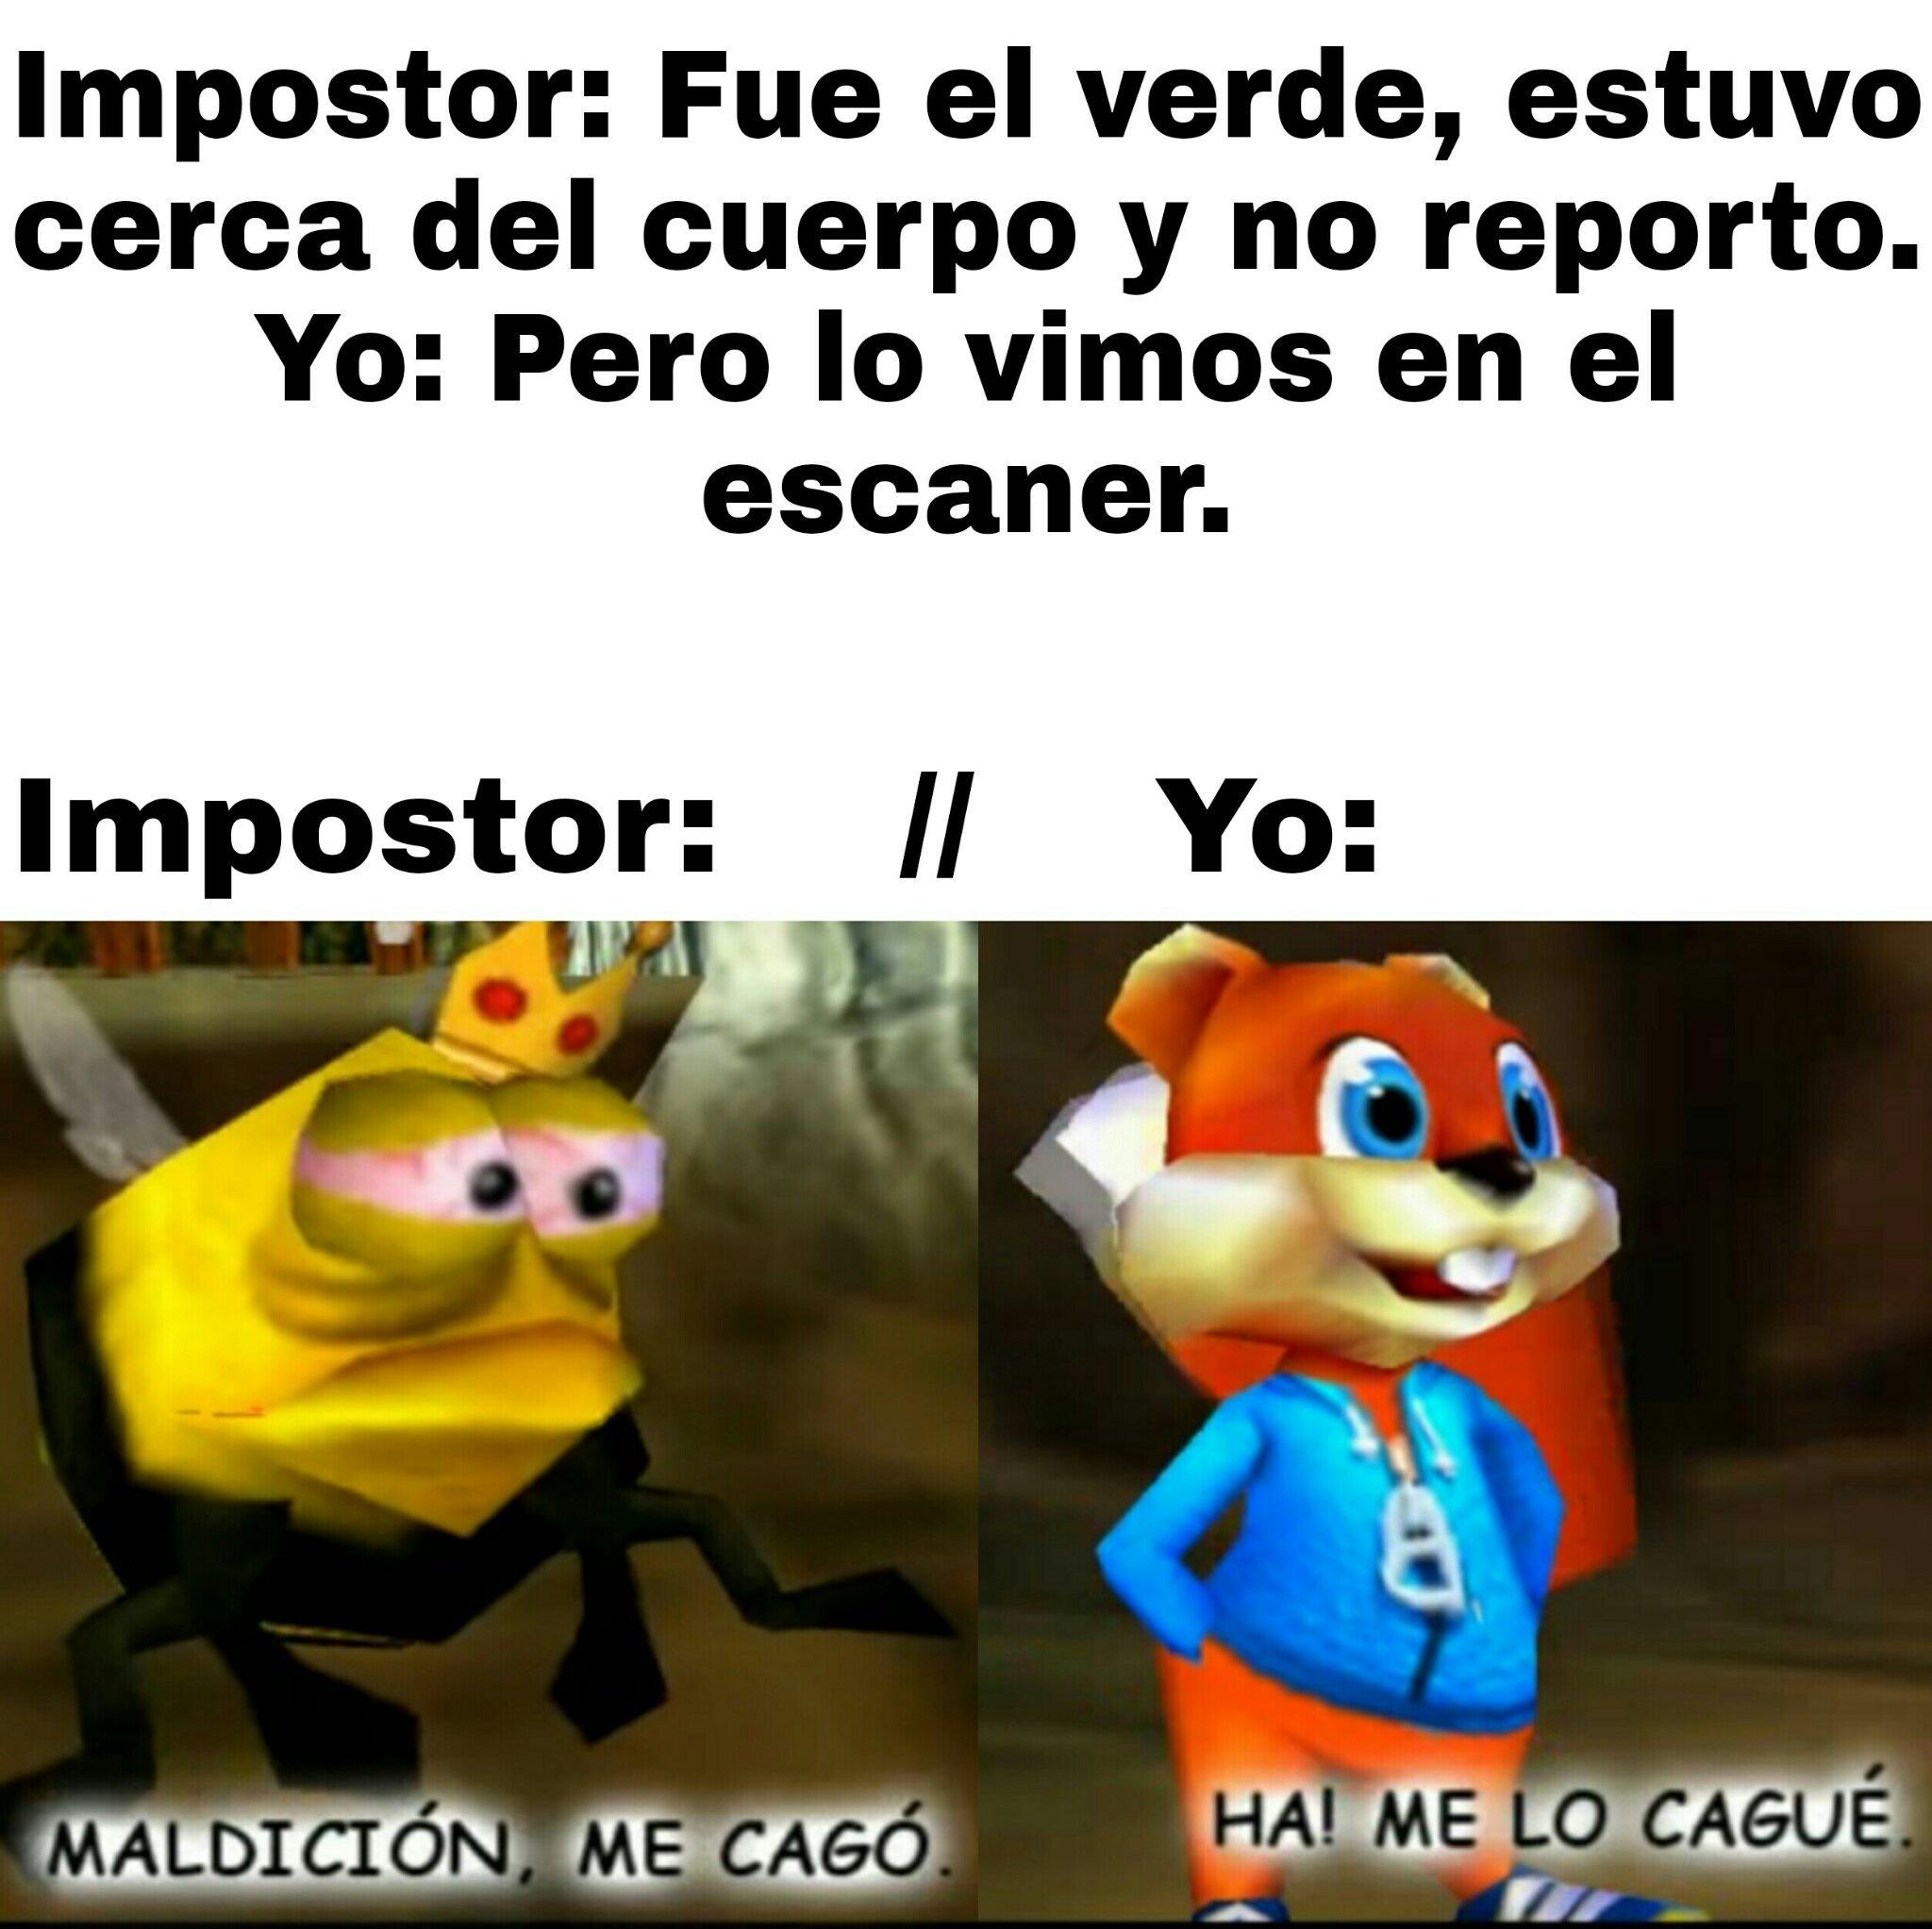 Ya valio el impostor - meme